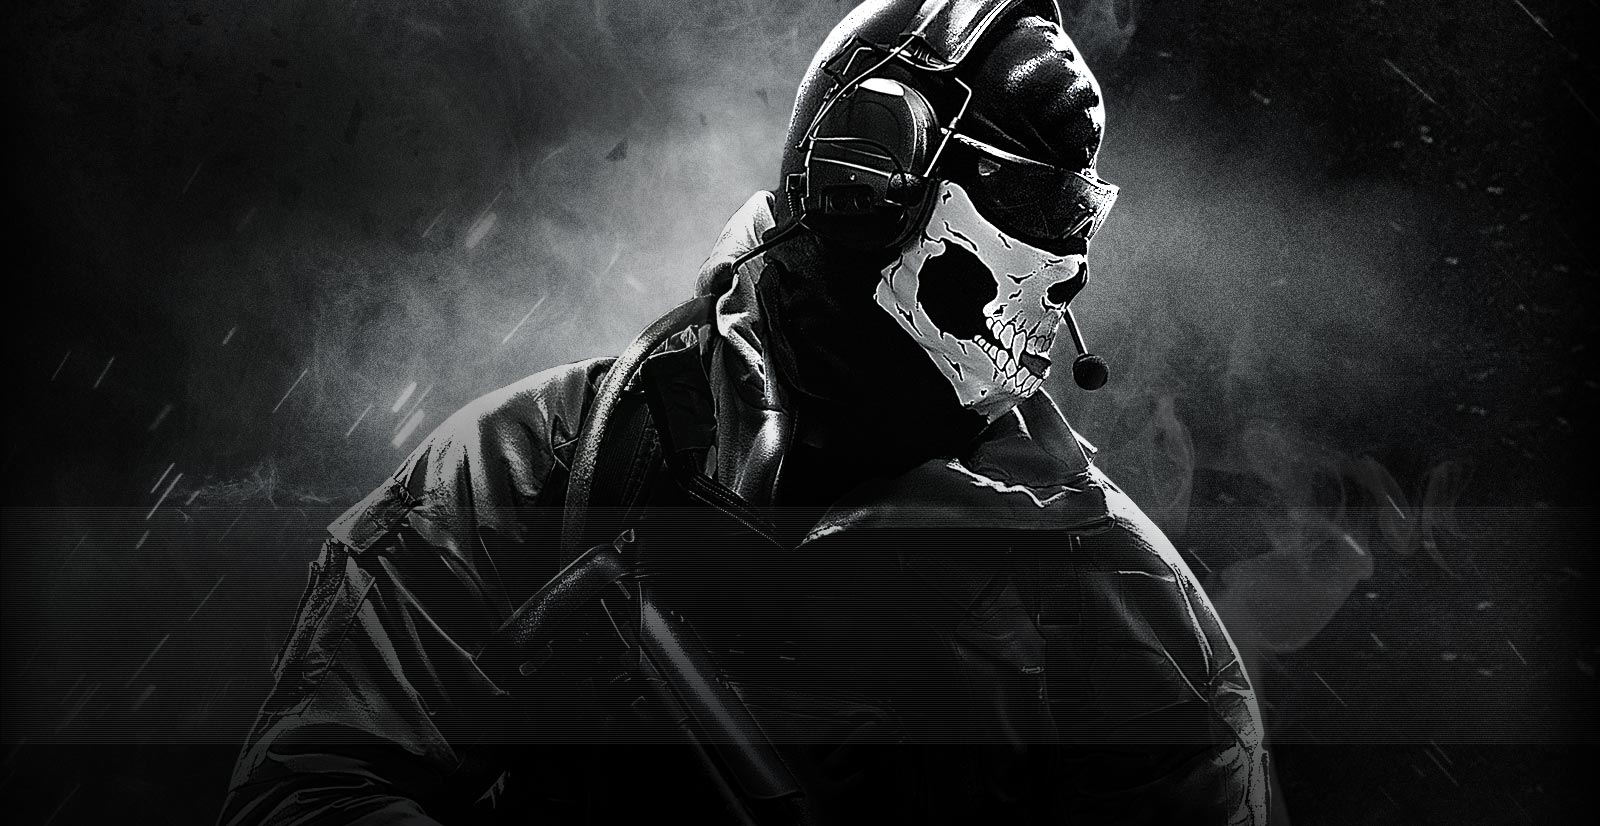 Free Download Call Of Duty Modern Warfare 2 Wallpaper Ghost 6328